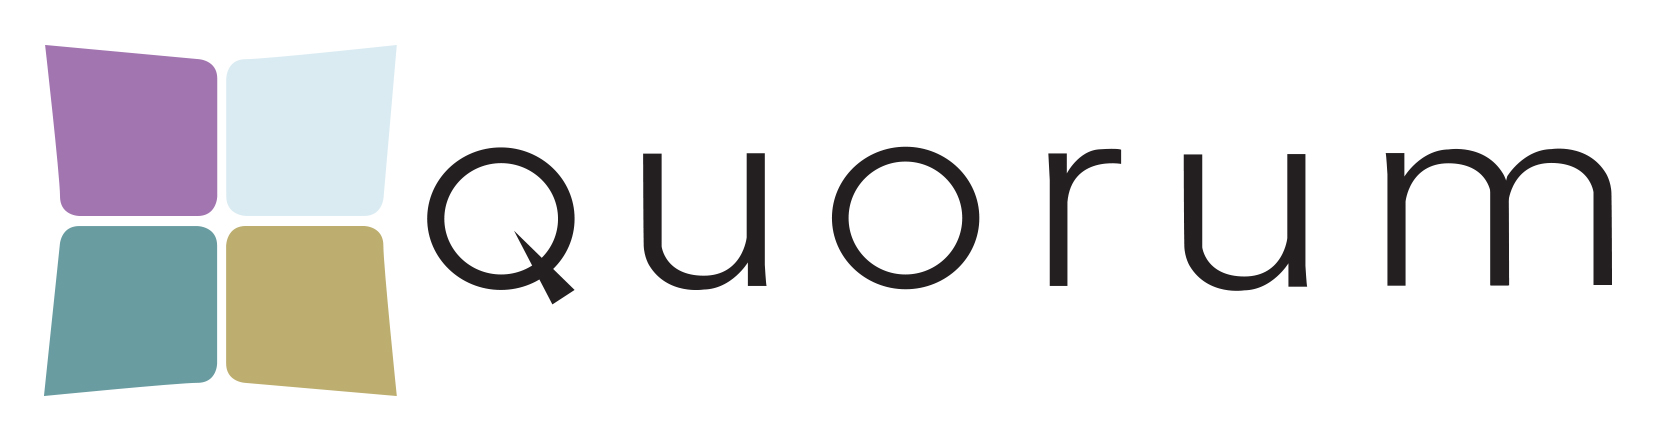 Quorum Network Resources